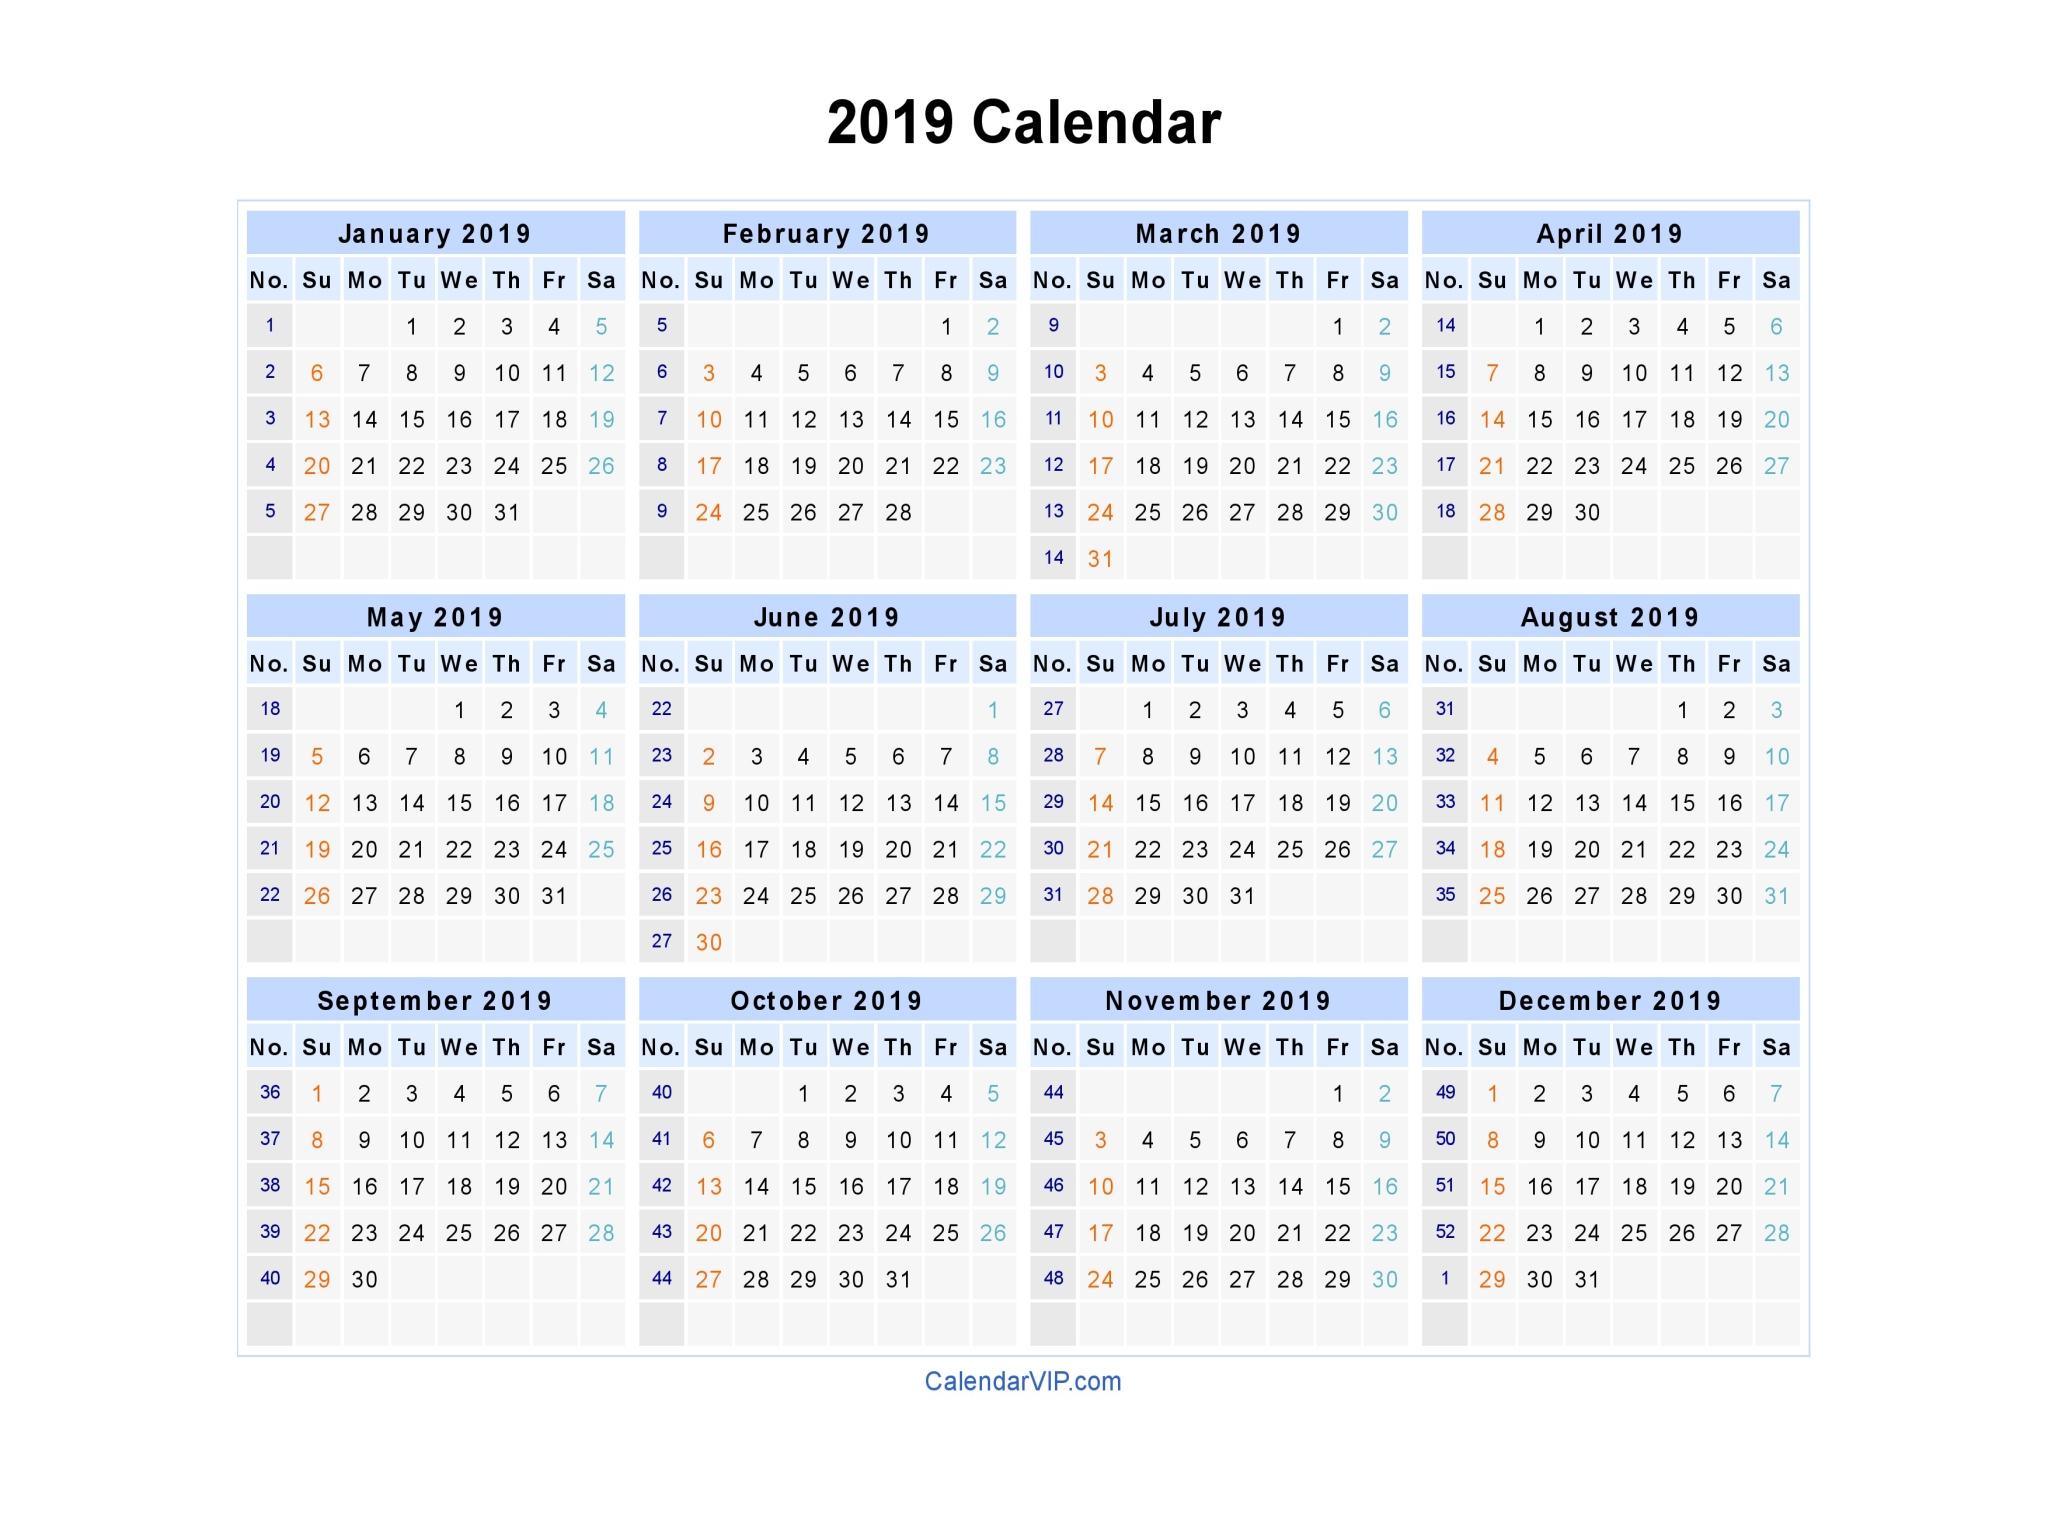 2019 Calendar - Blank Printable Calendar Template In Pdf Word Excel intended for Word Calendar Template Excel